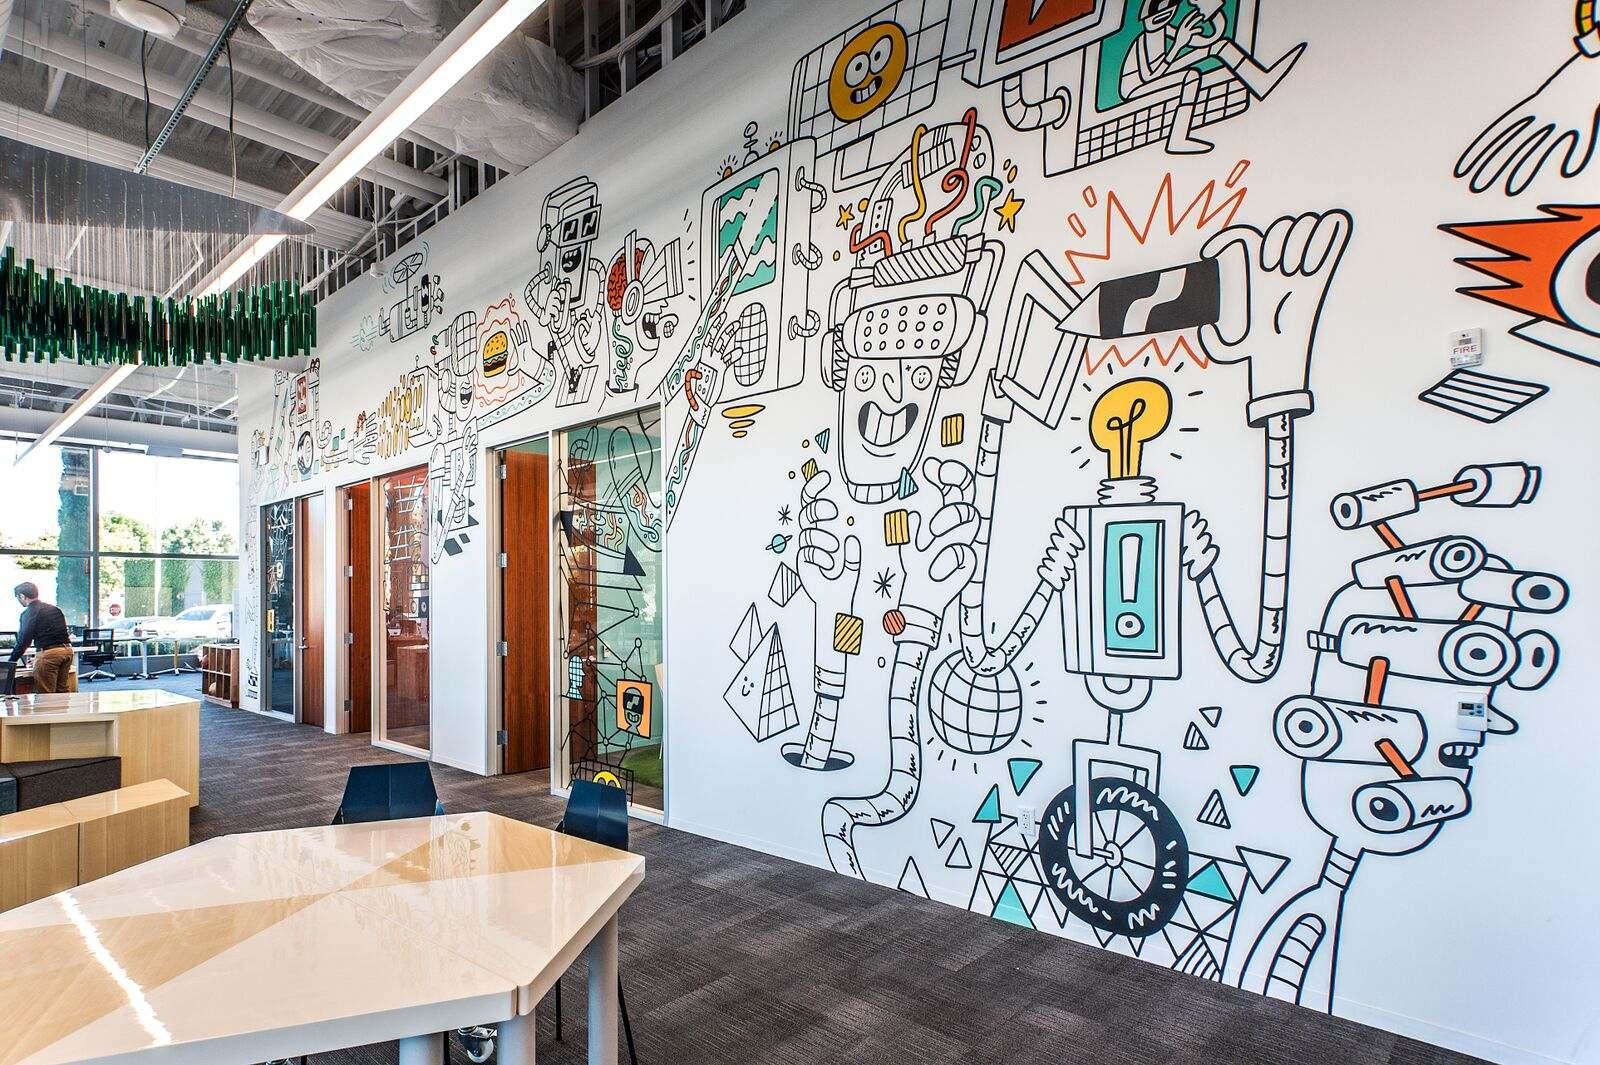 murals - greg kletsel illustration